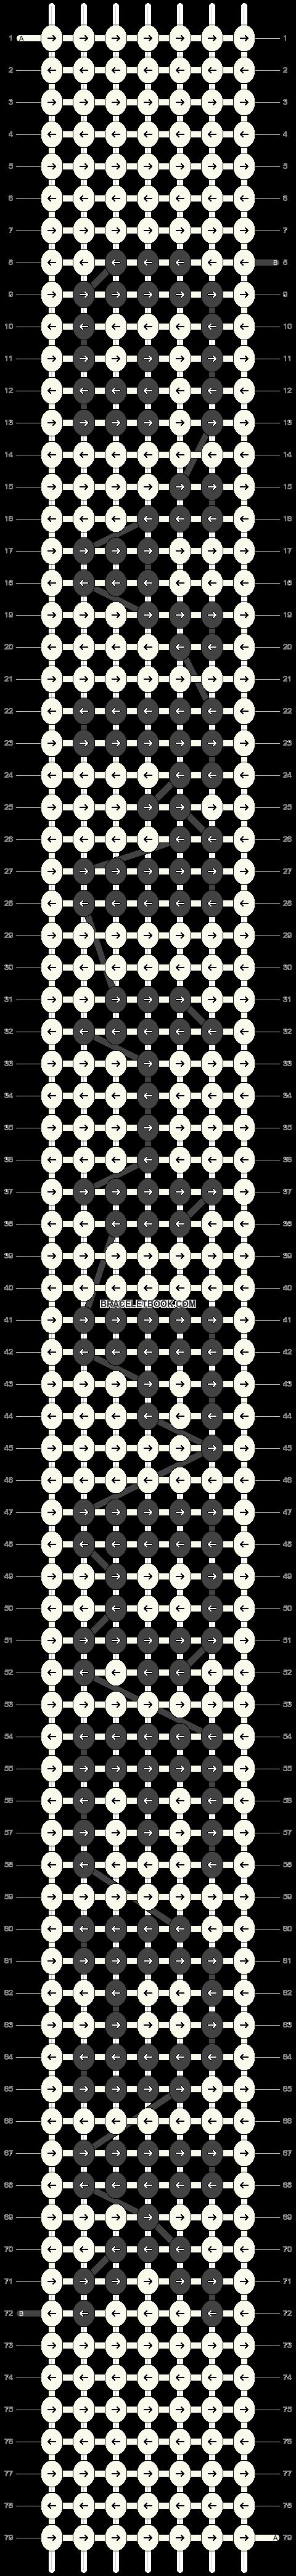 Alpha pattern #11646 pattern